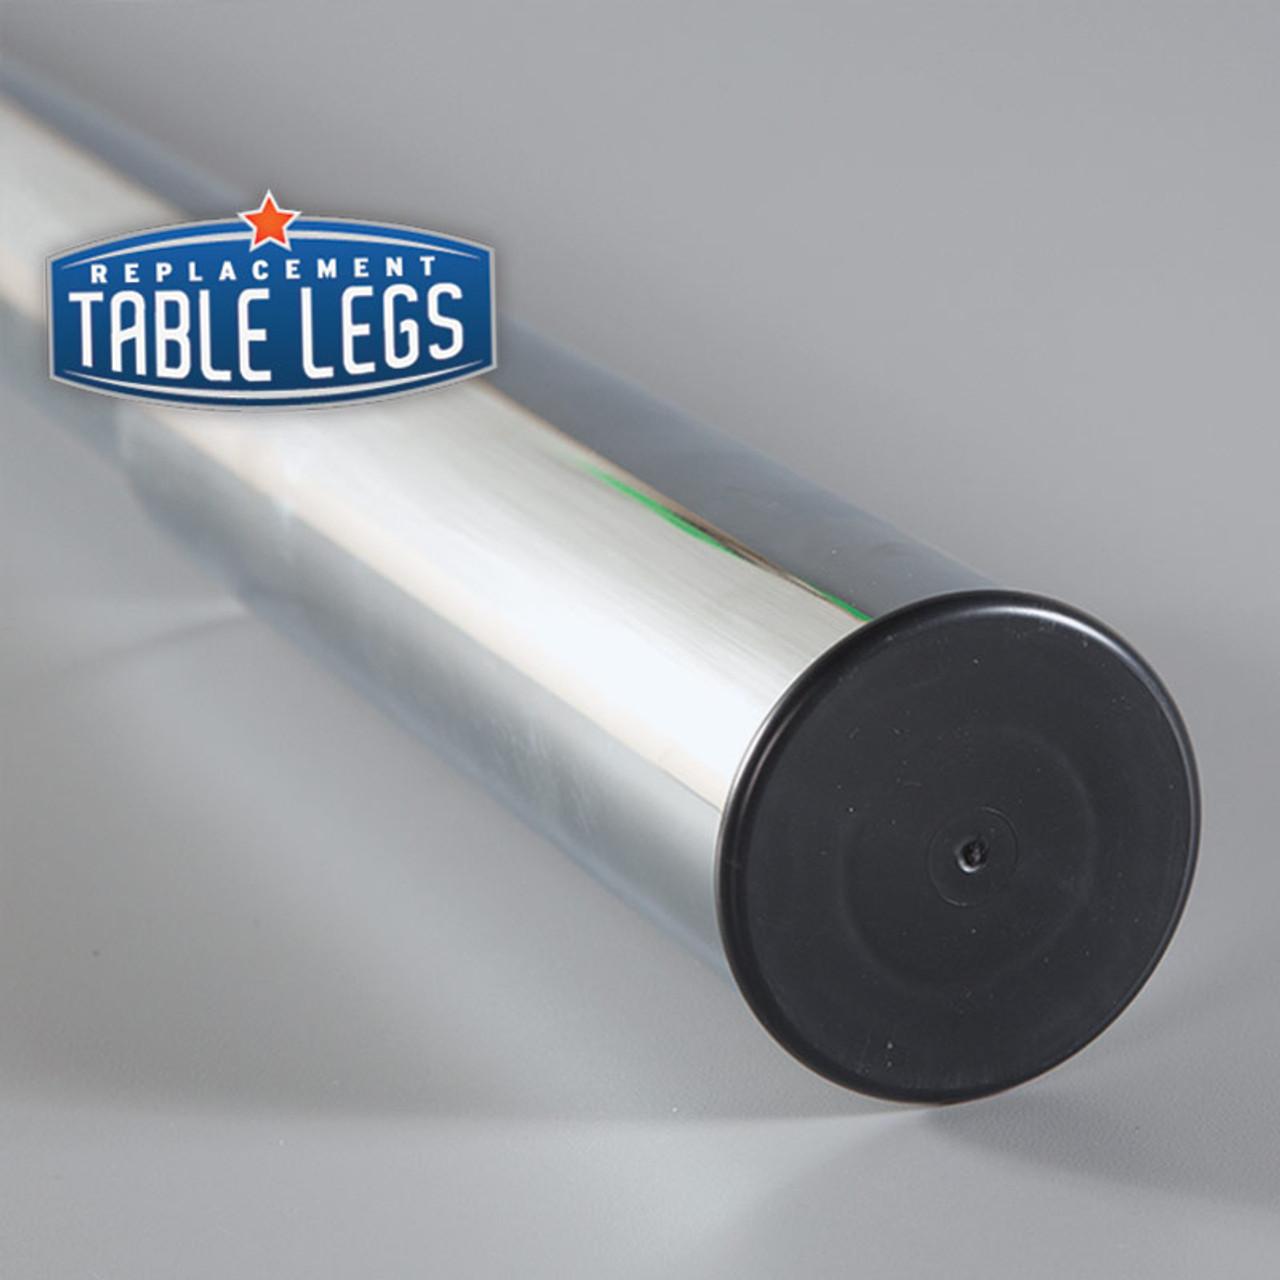 Studio Telescoping Table Leg foot detail - replacementtablelegs.com